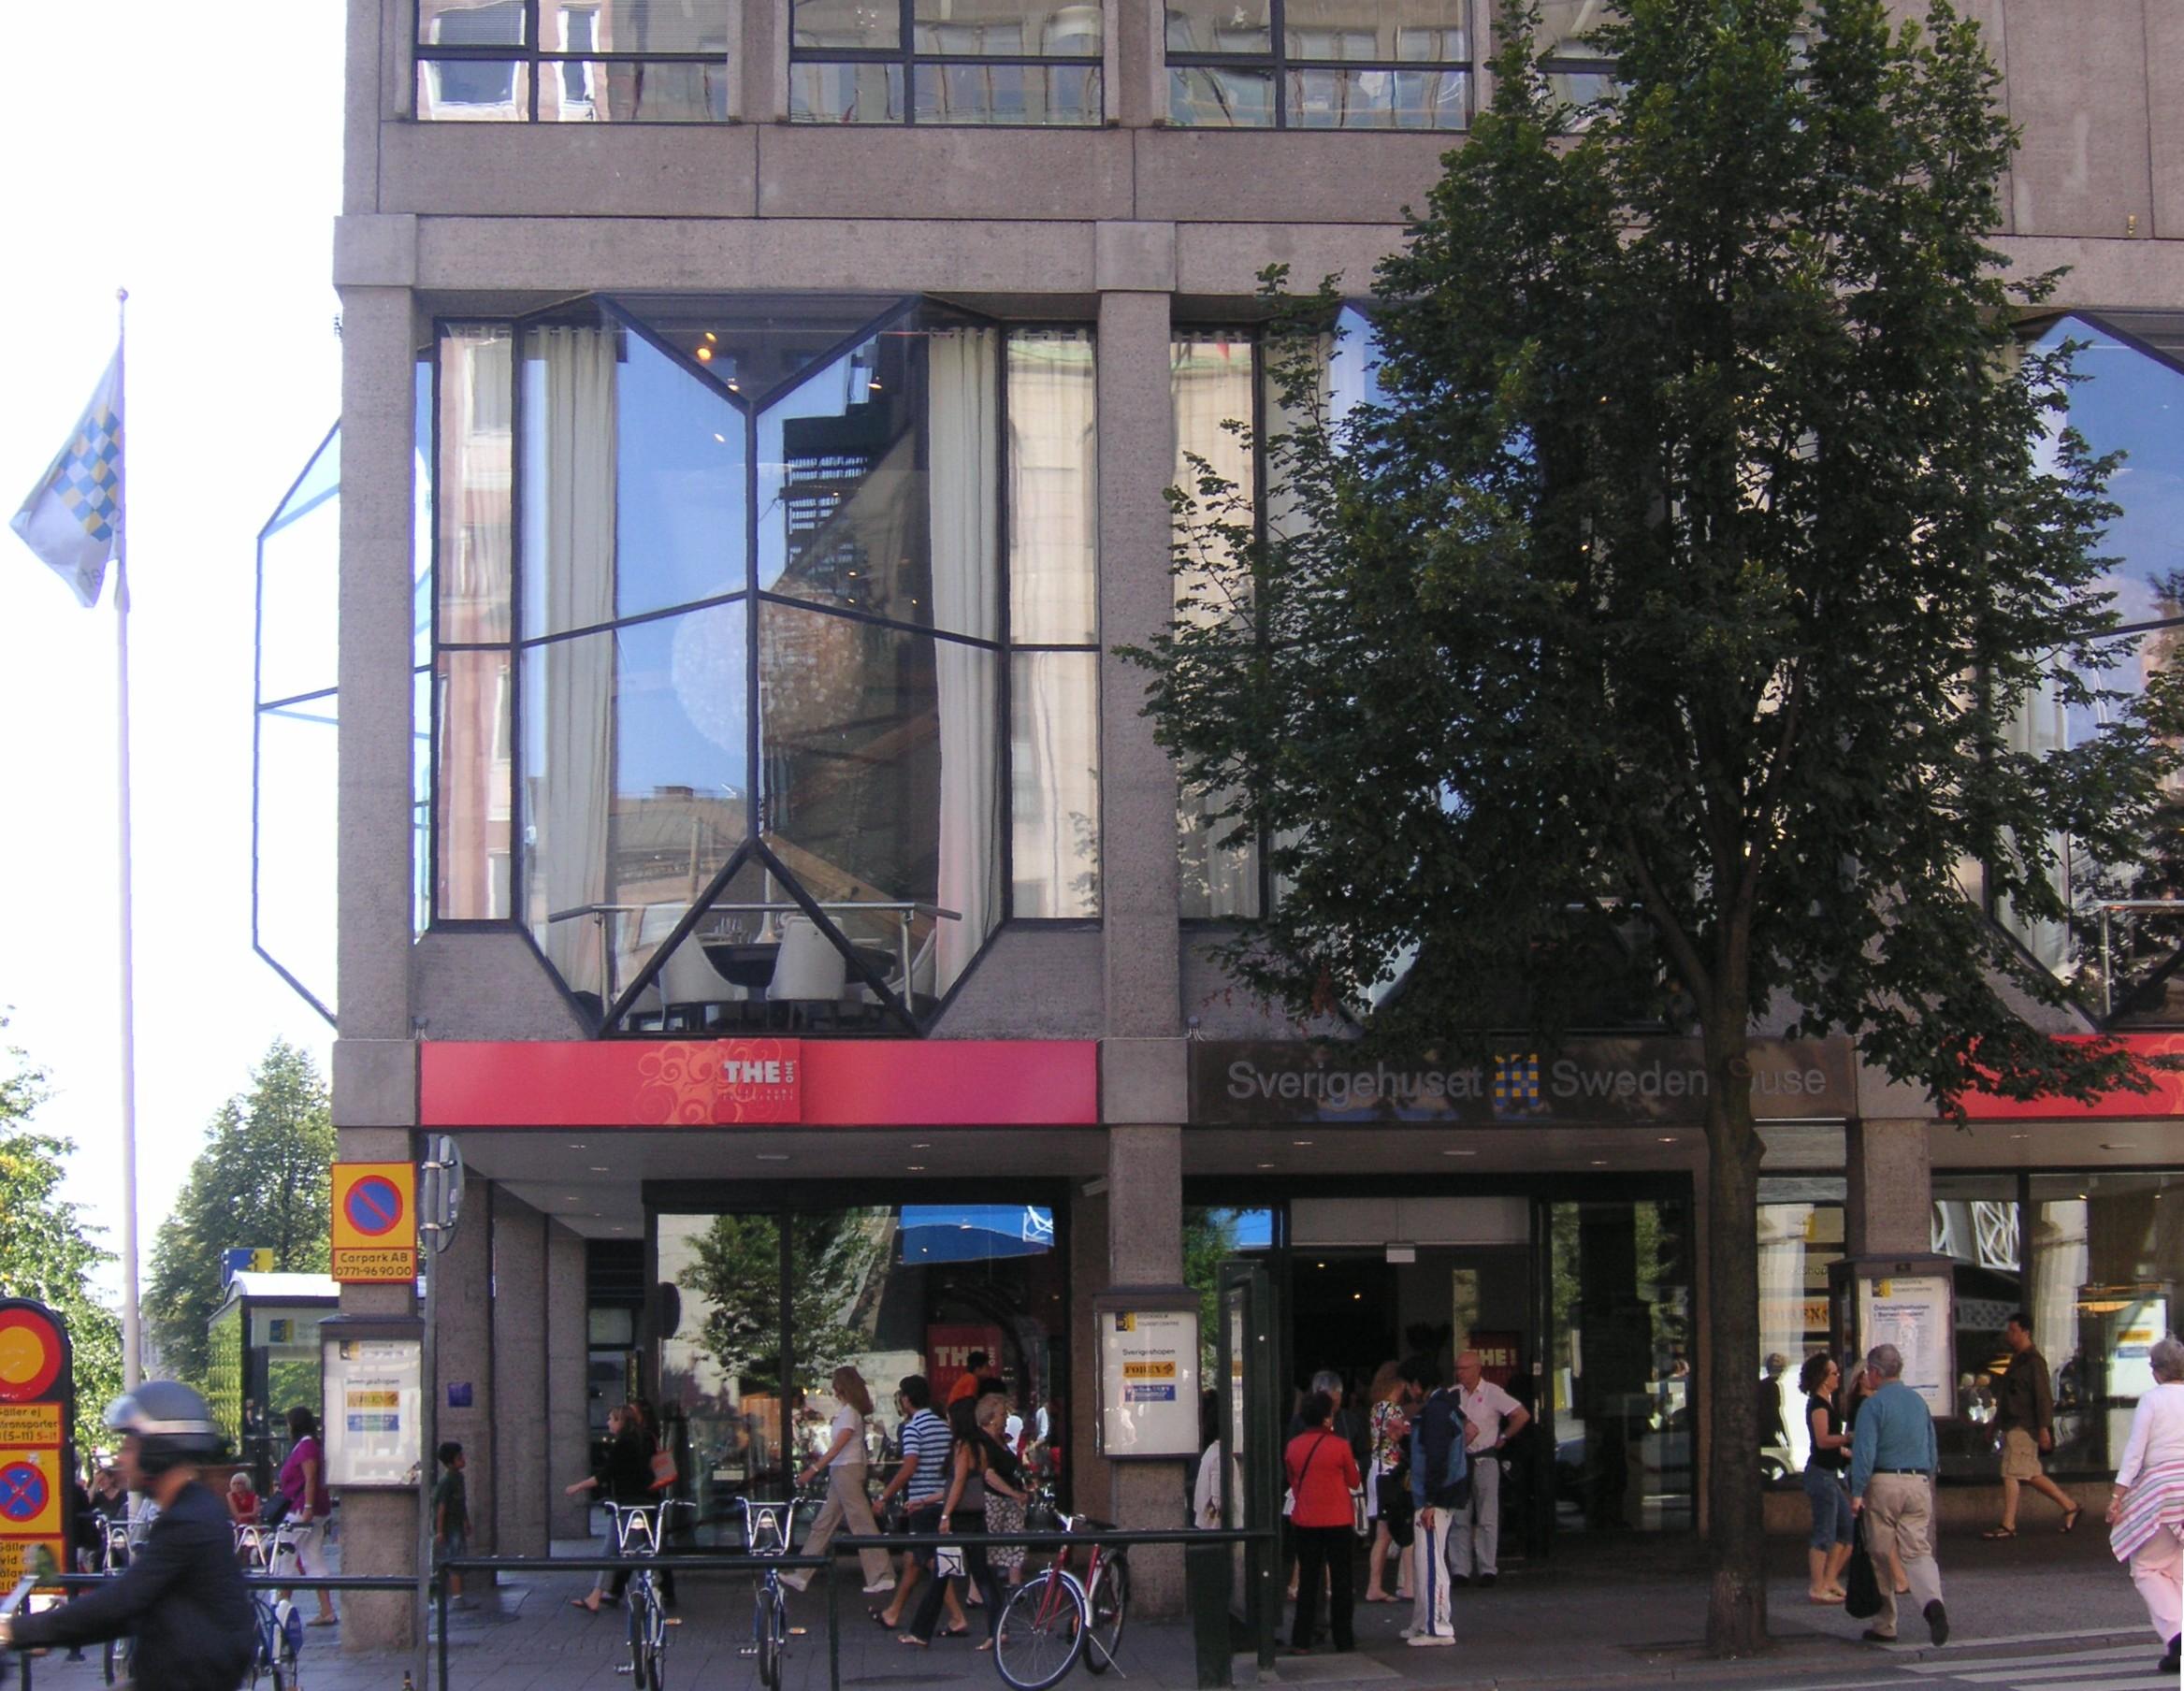 La Maison De La Suede file:sverigehuset 1 - wikimedia commons